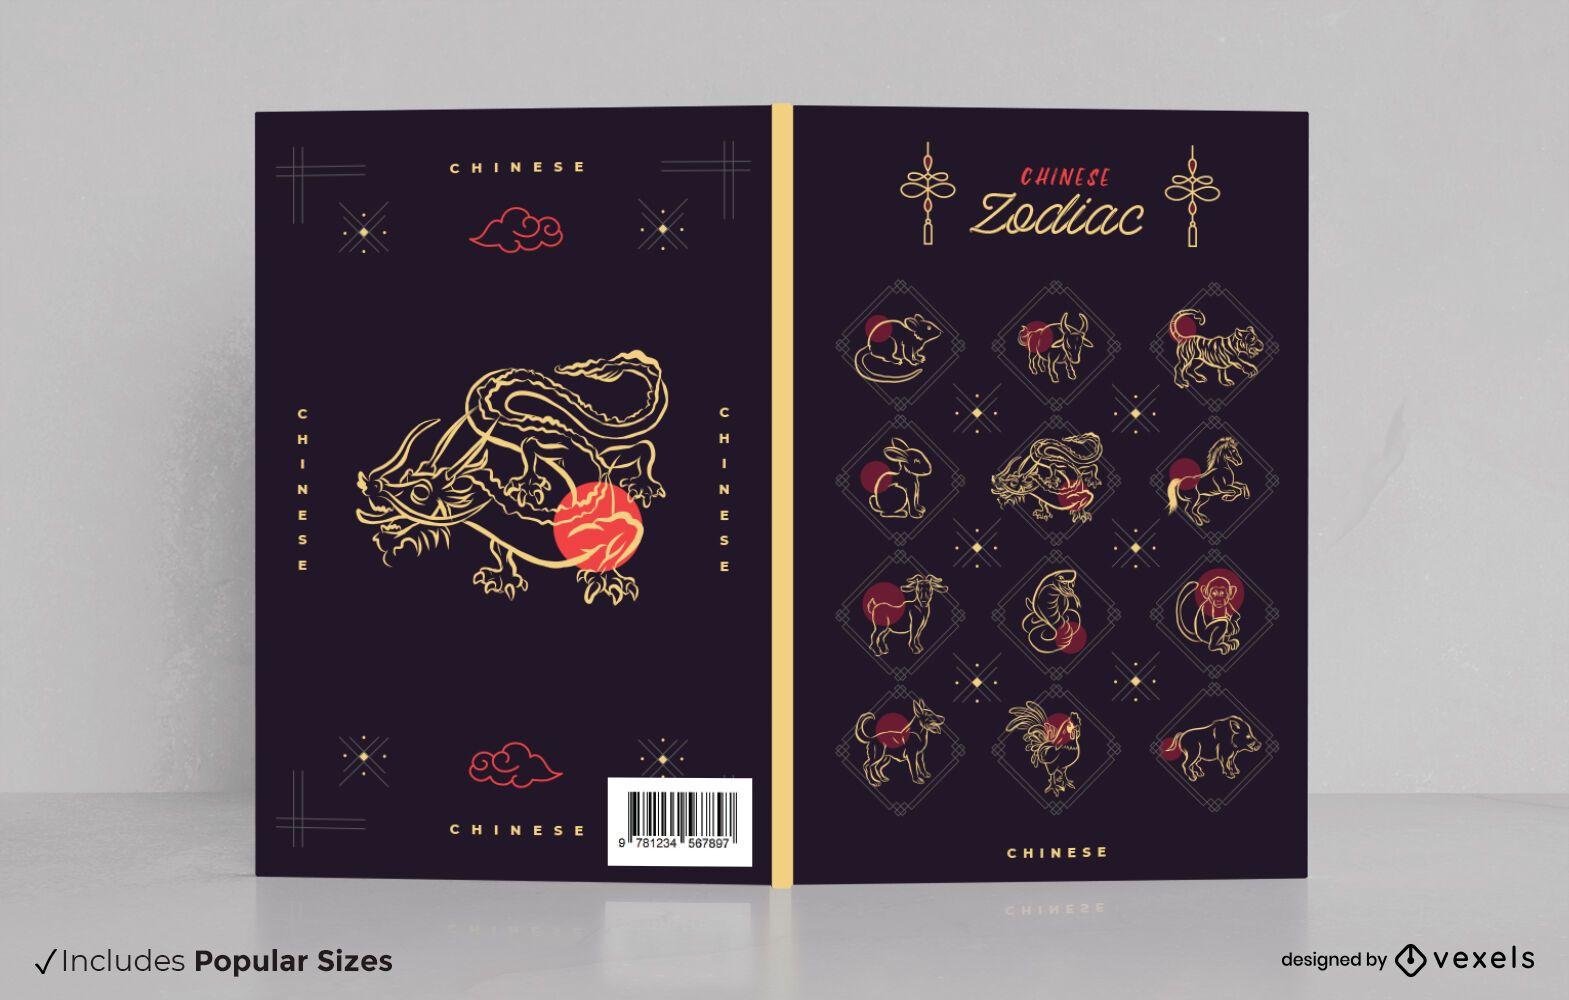 Chinese zodiac book cover design